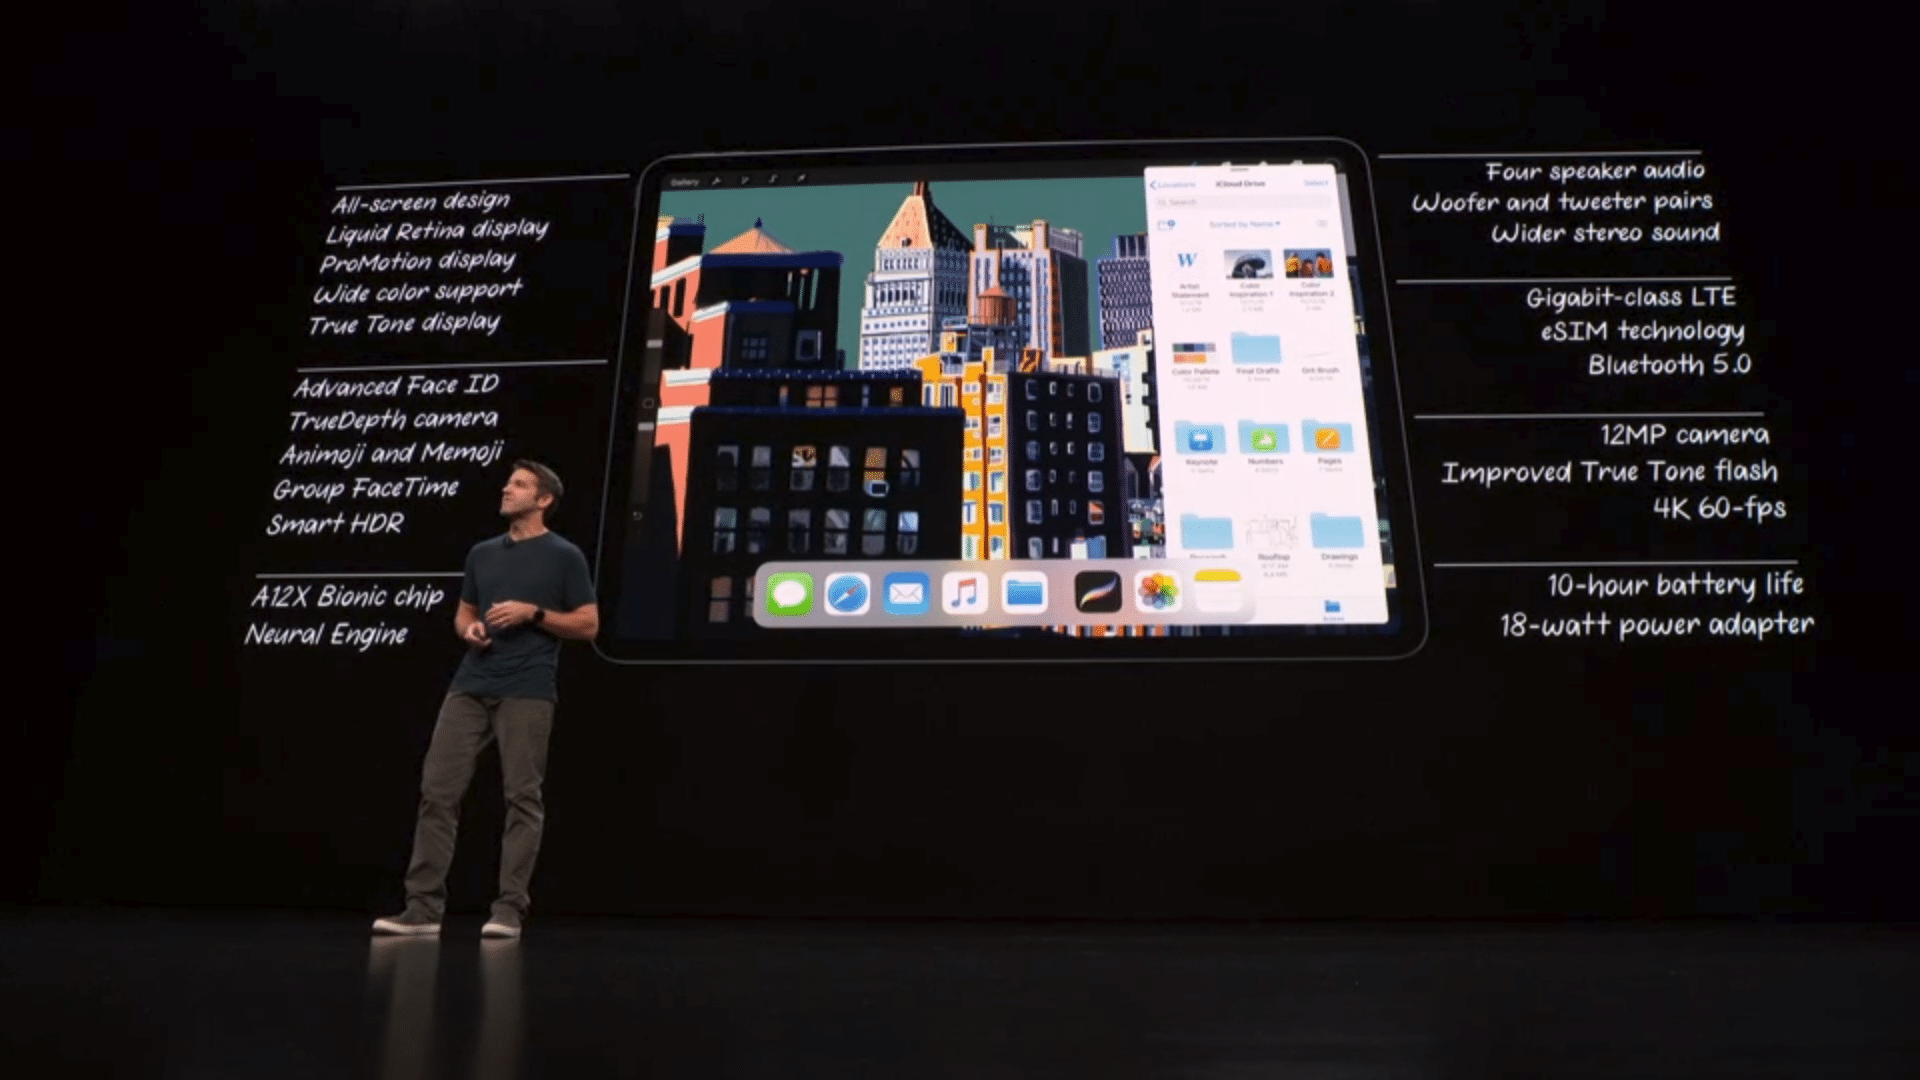 كل ماتريد معرفته عن iPad Pro 2018 2